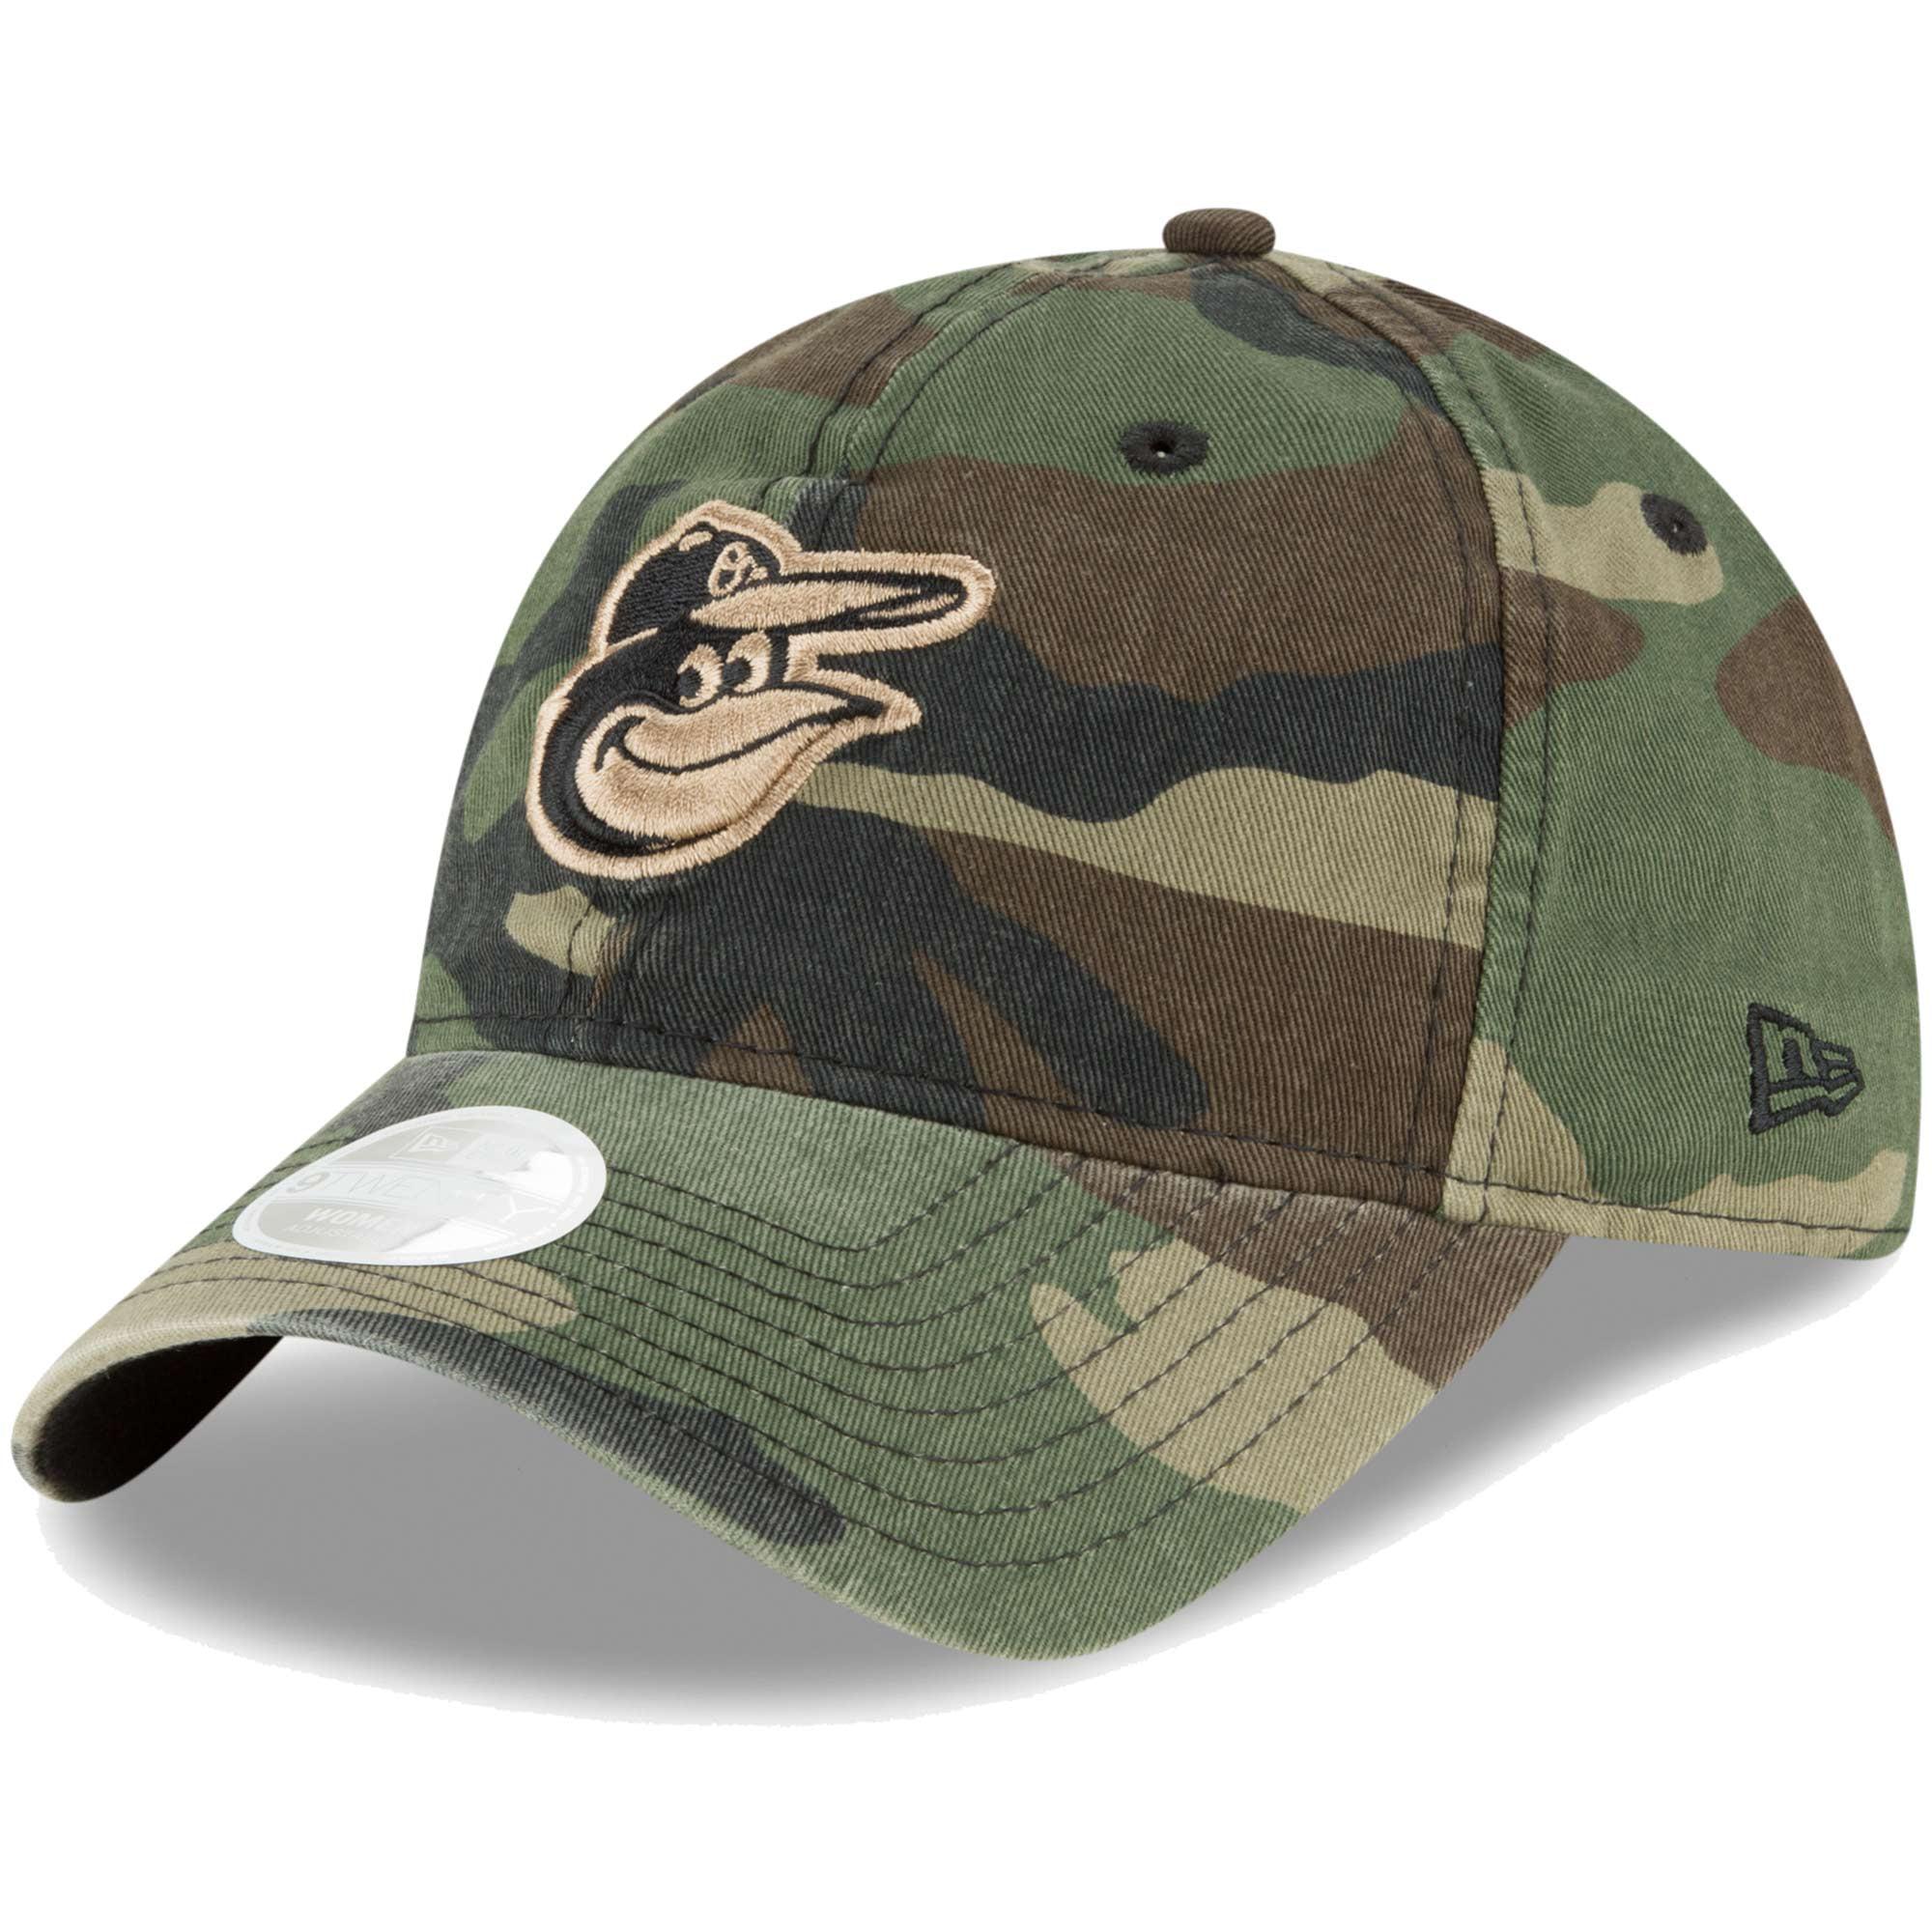 Baltimore Orioles New Era Women's Core Classic Twill 9TWENTY Adjustable Hat - Camo - OSFA